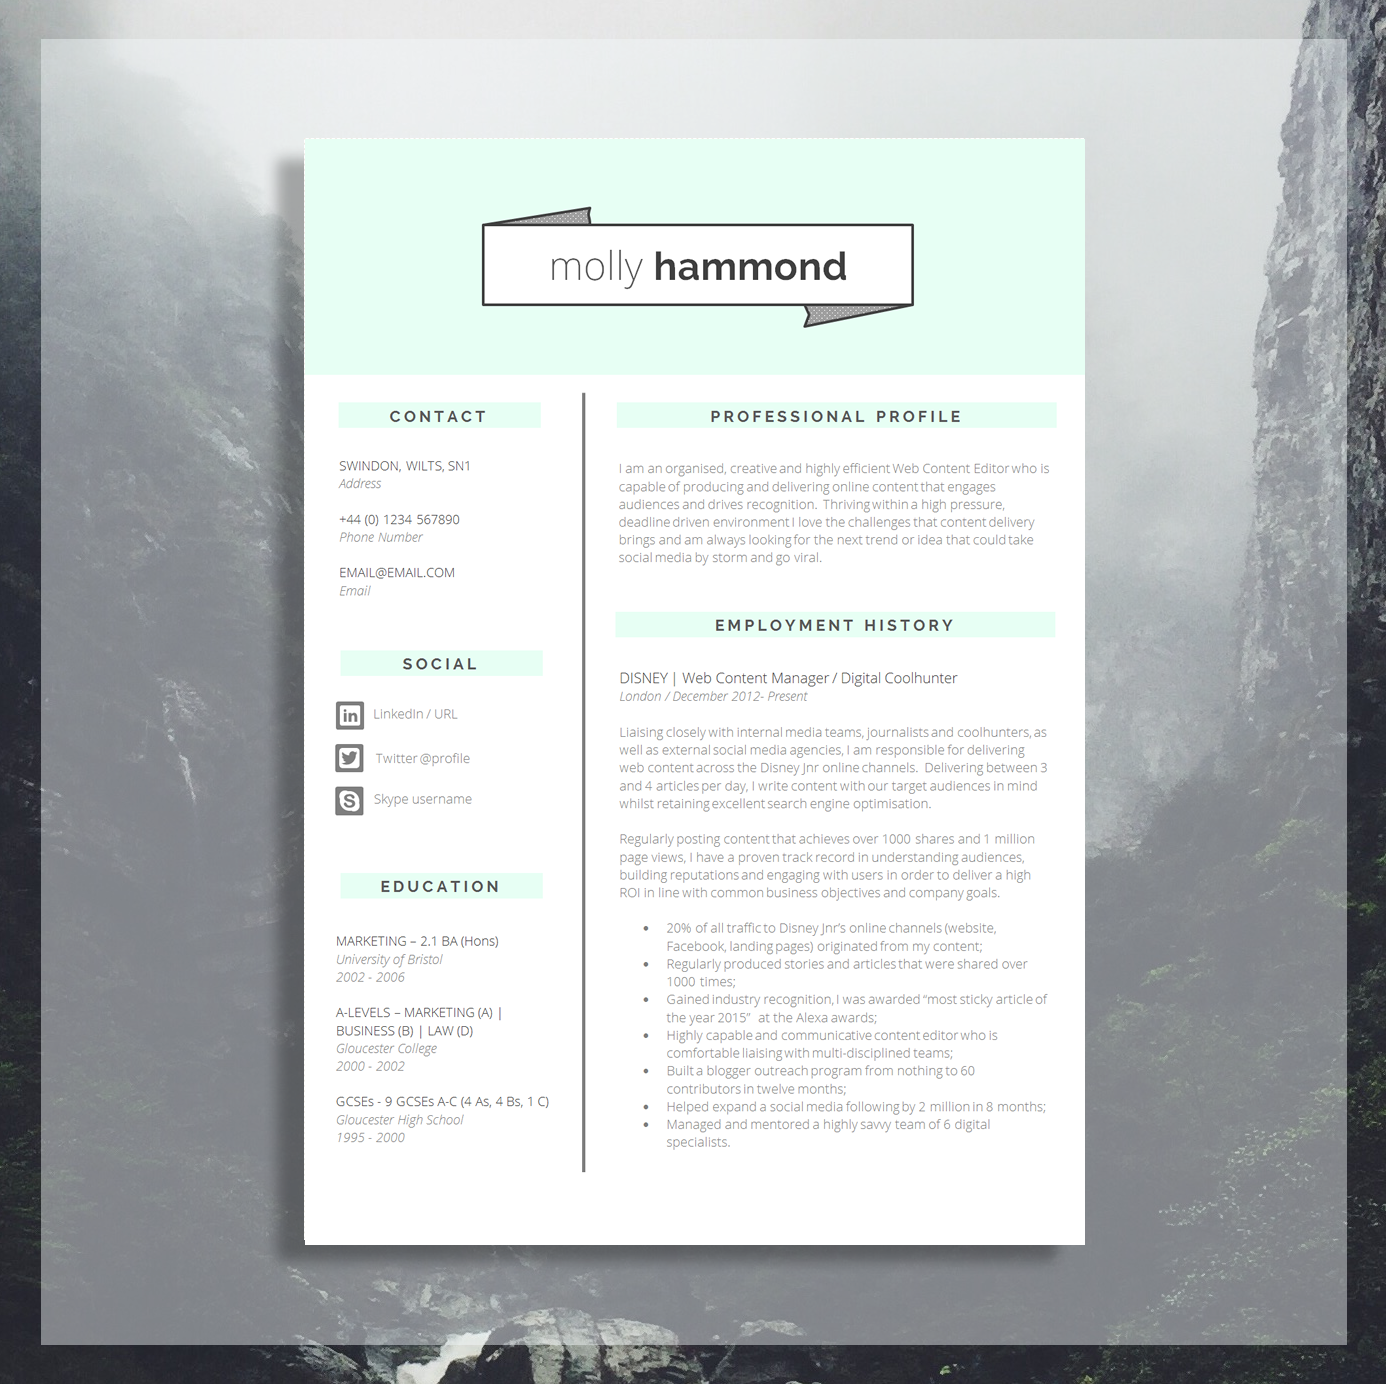 Creative Cv Template Creative Resume Application Advice Ms Word Resume Design Cv Design Instant Download Fitzrovia The Career